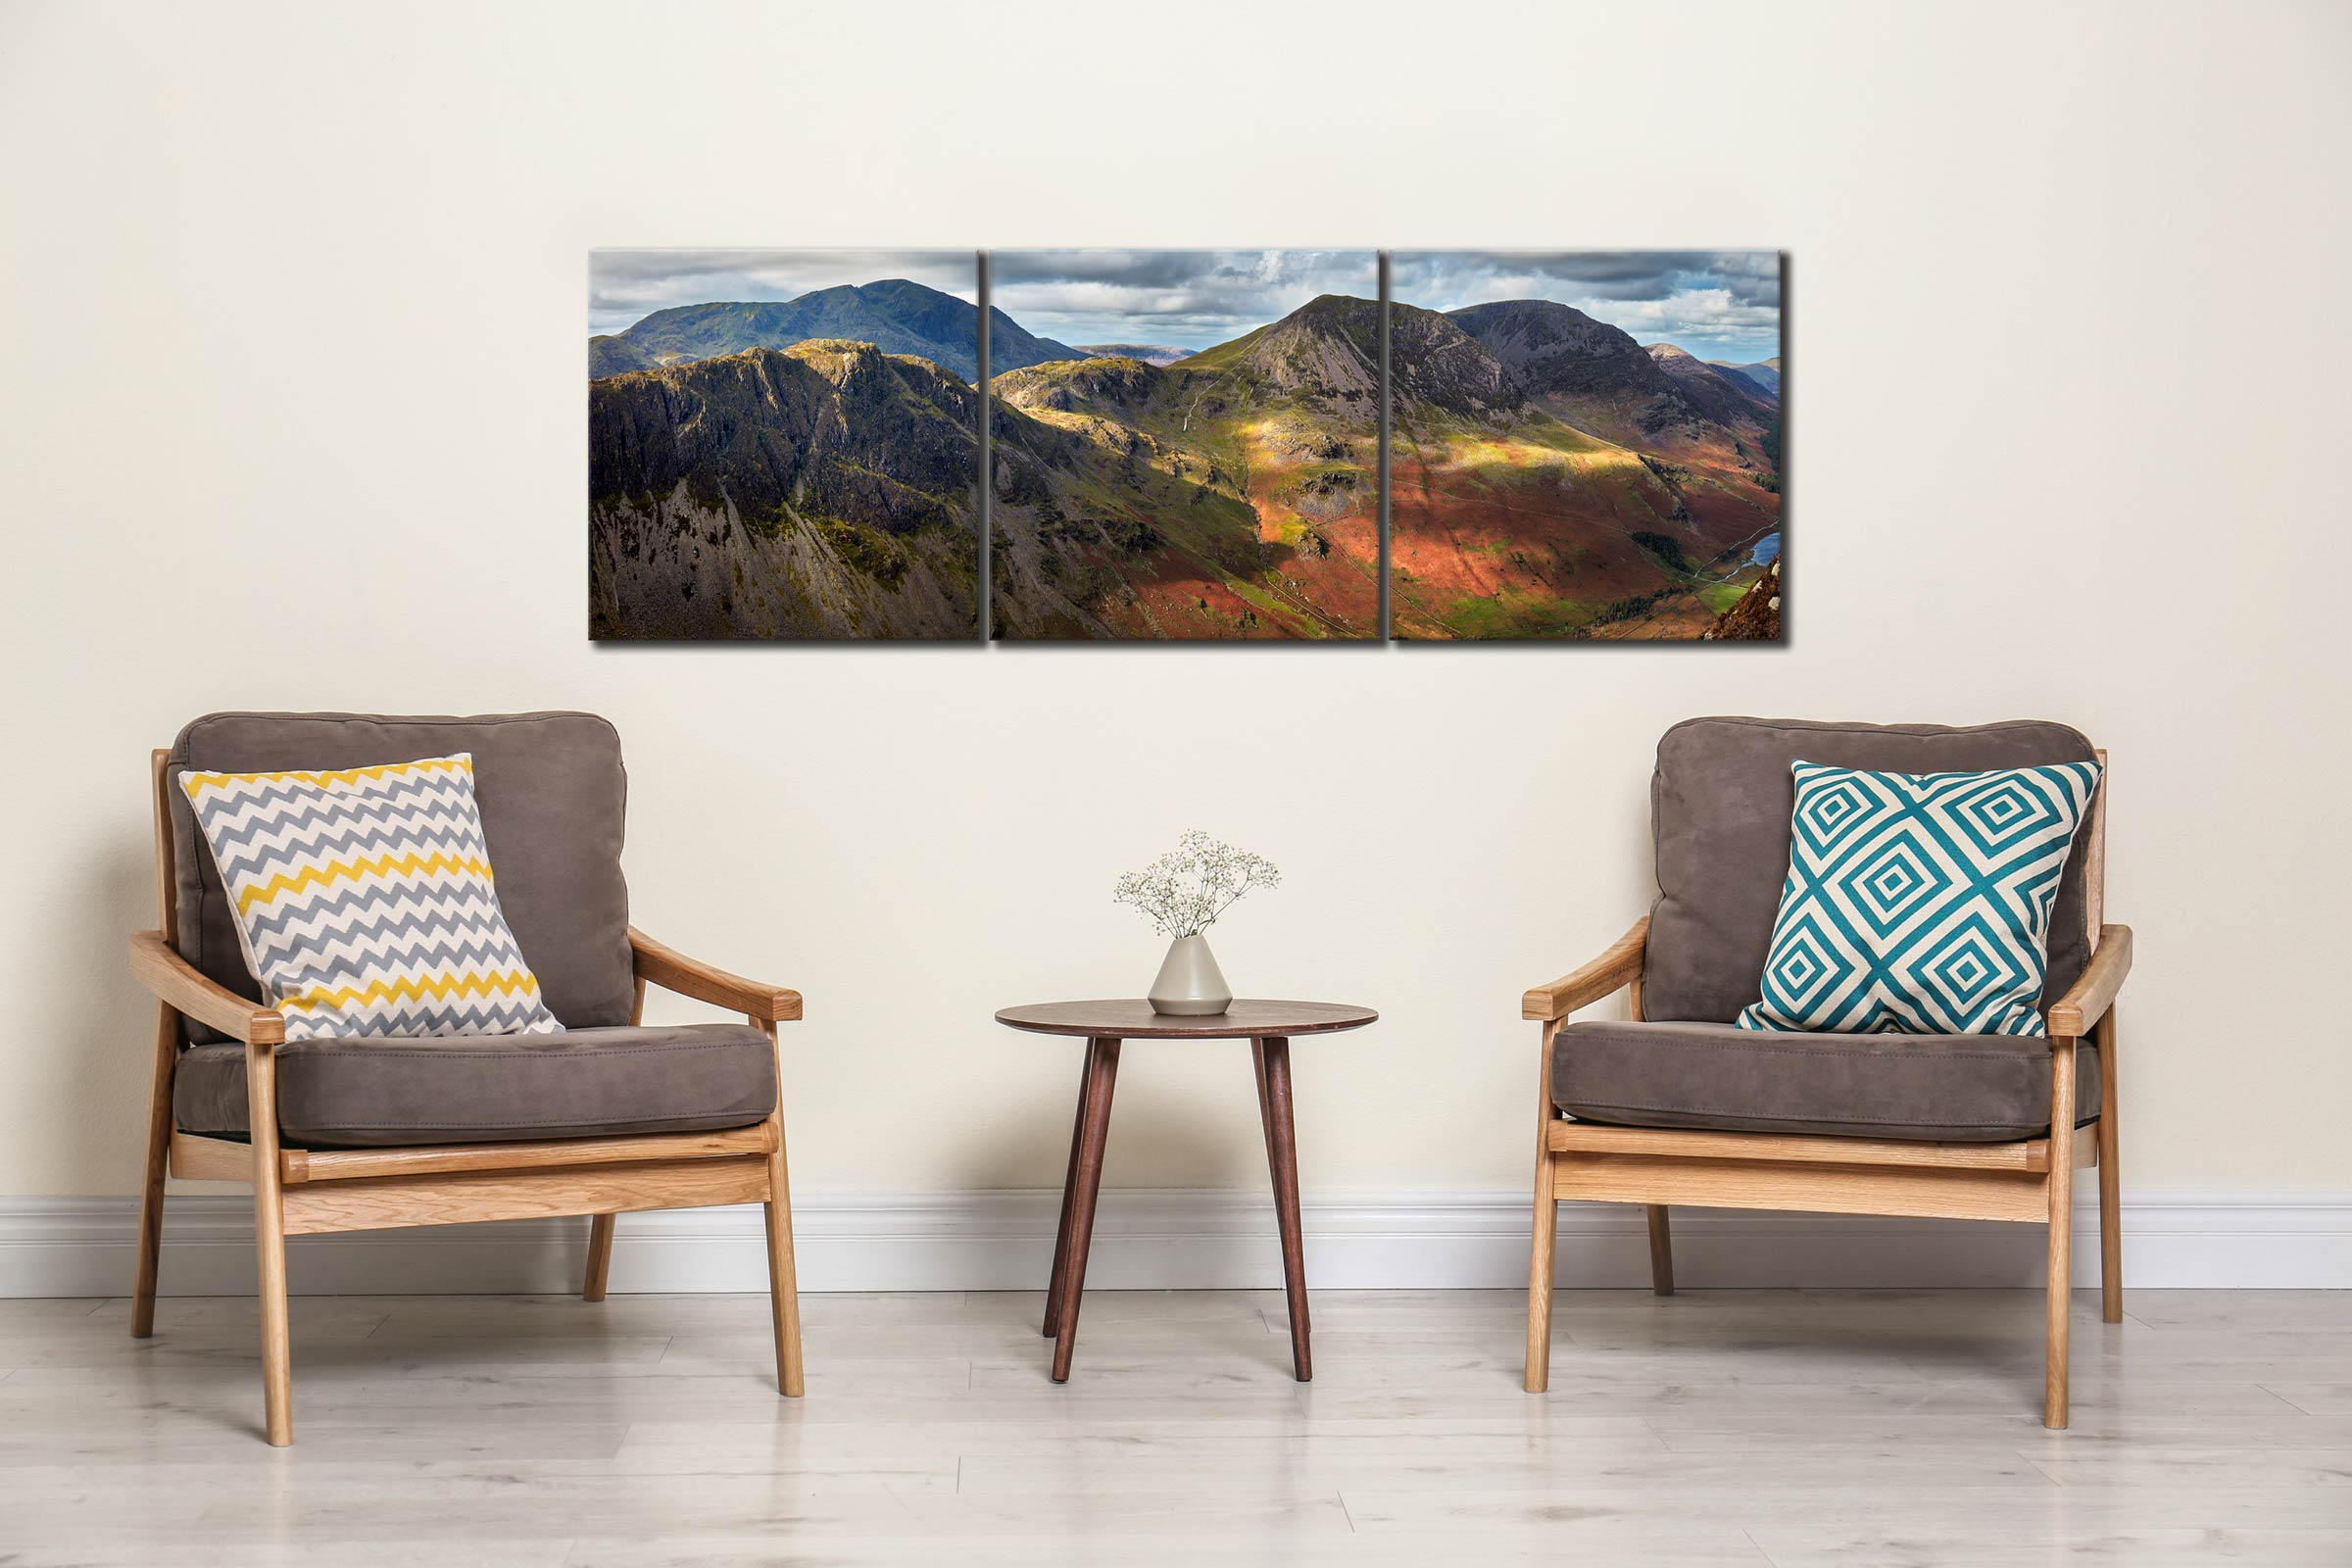 Haystacks High Crag High Stile - 3 Panel Canvas on Wall